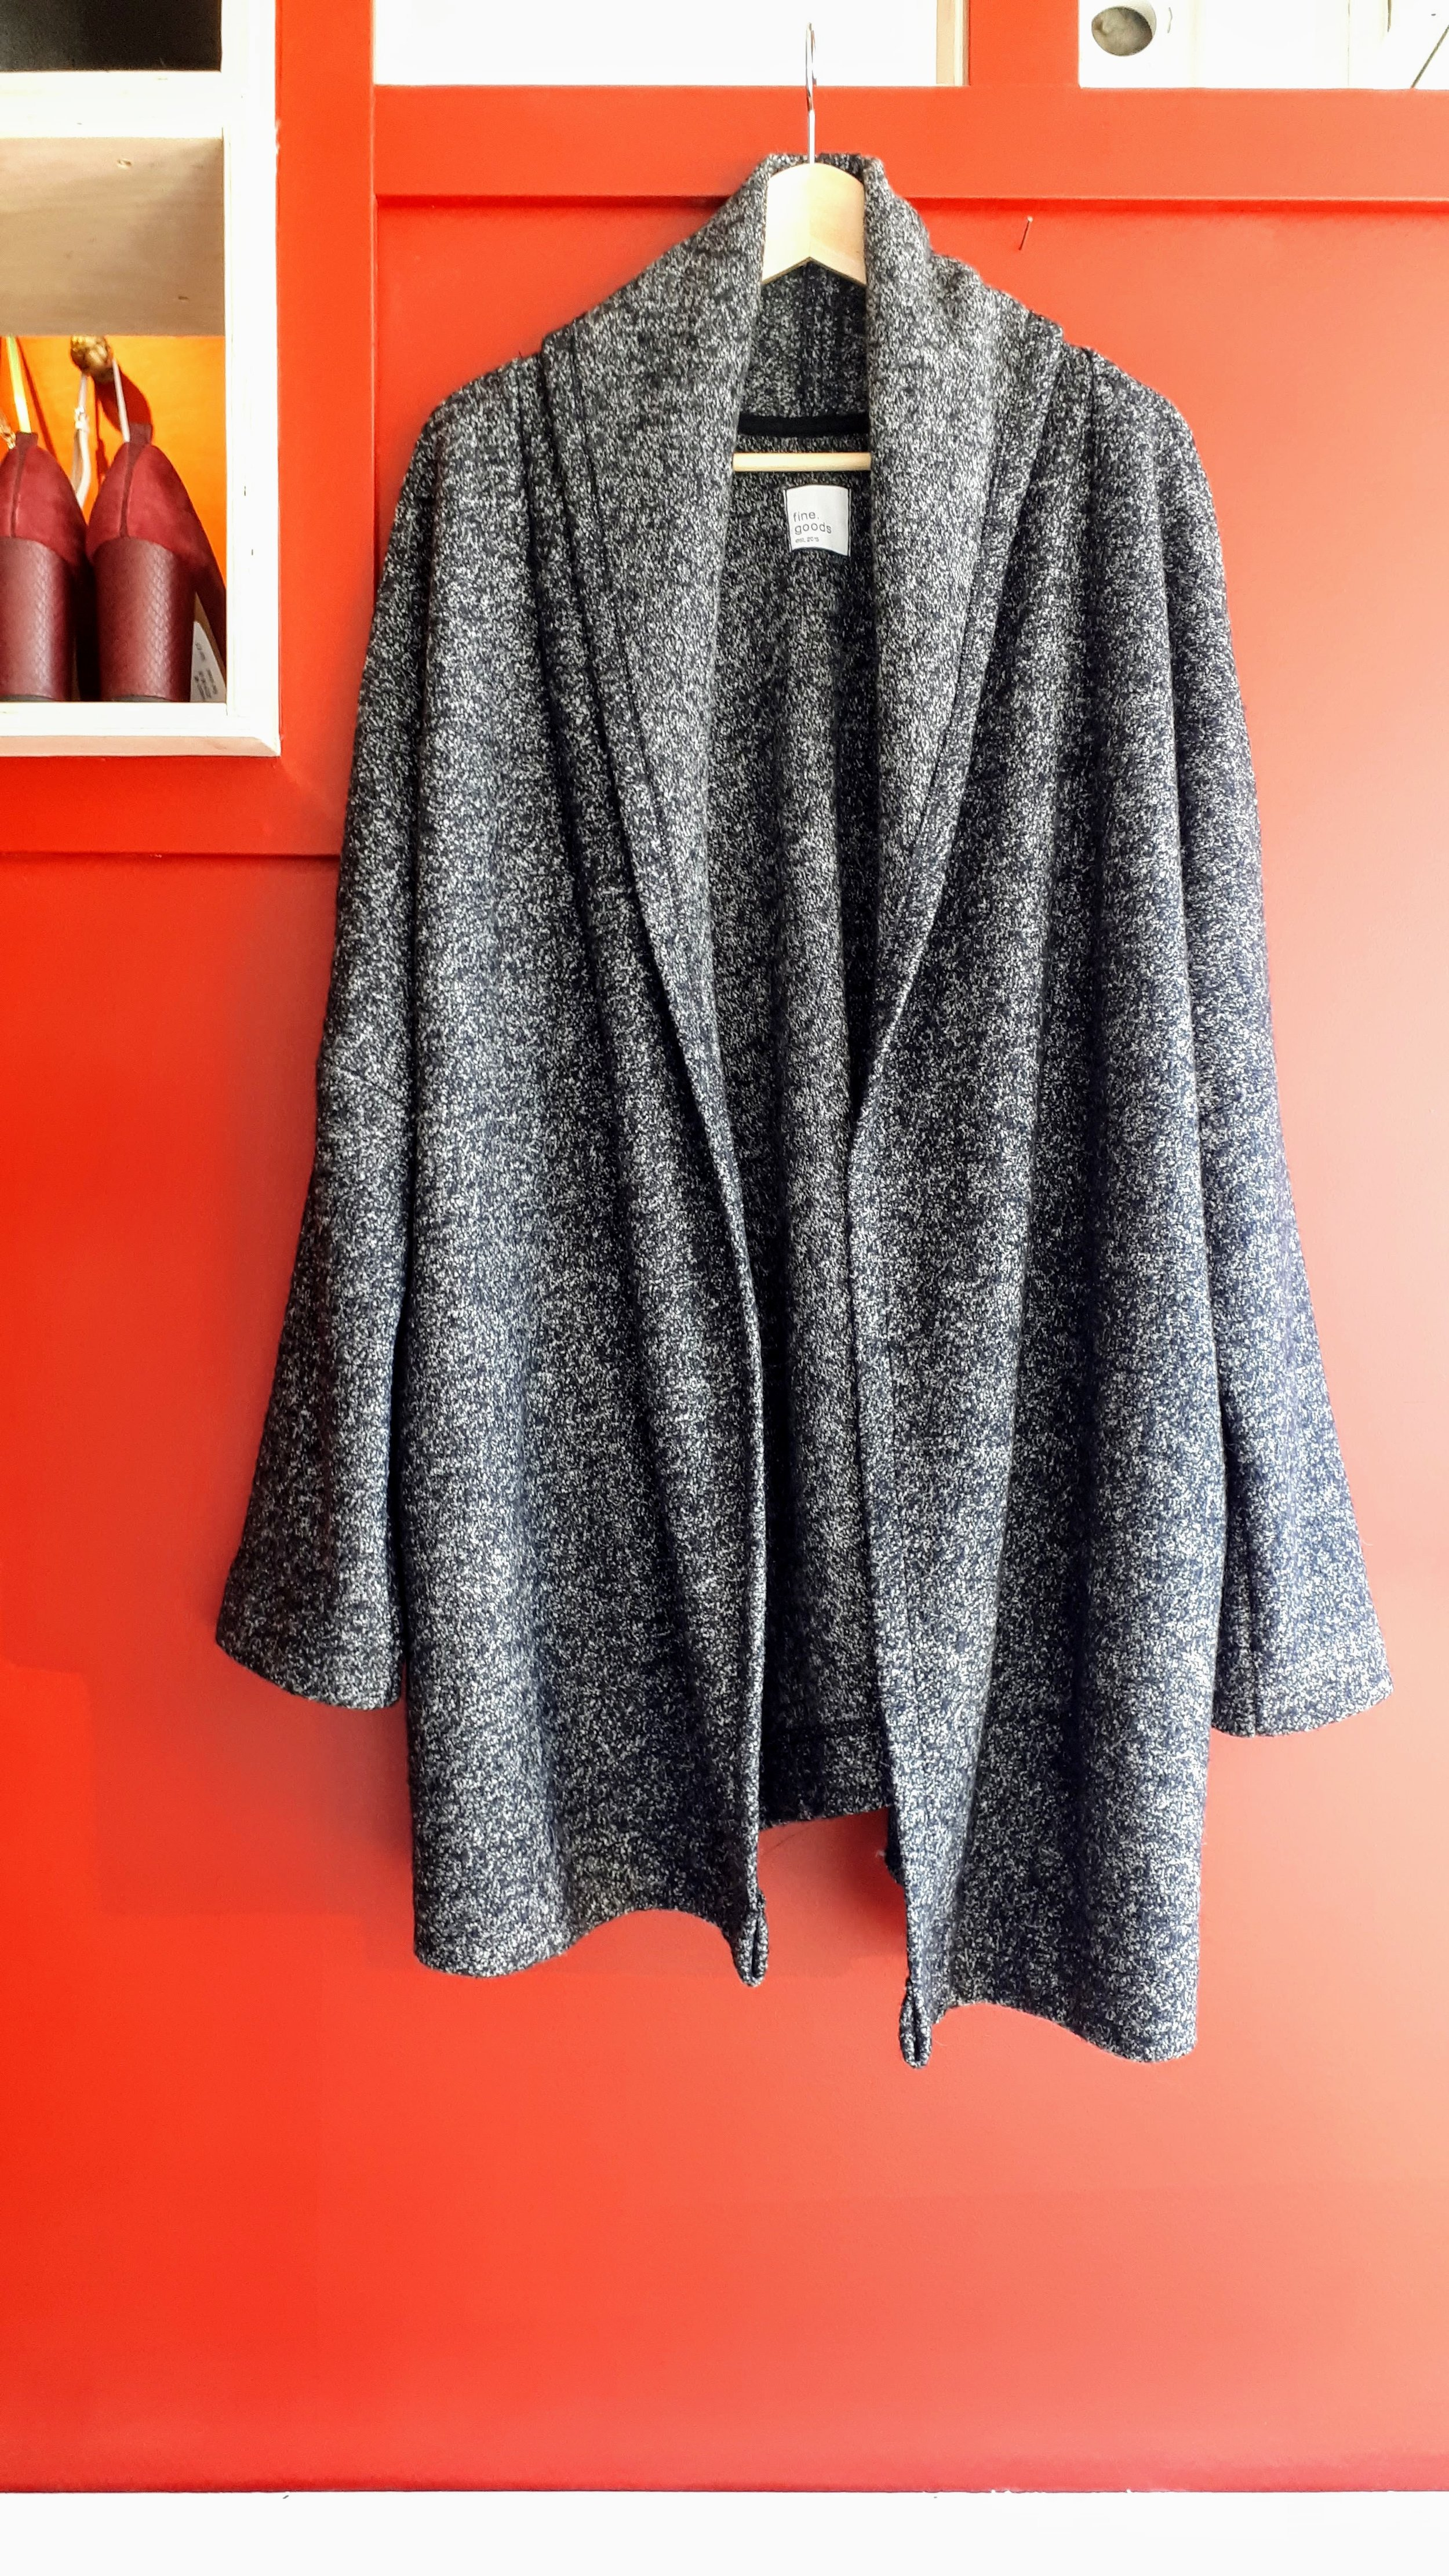 Fine Goods sweater; Size L, $45